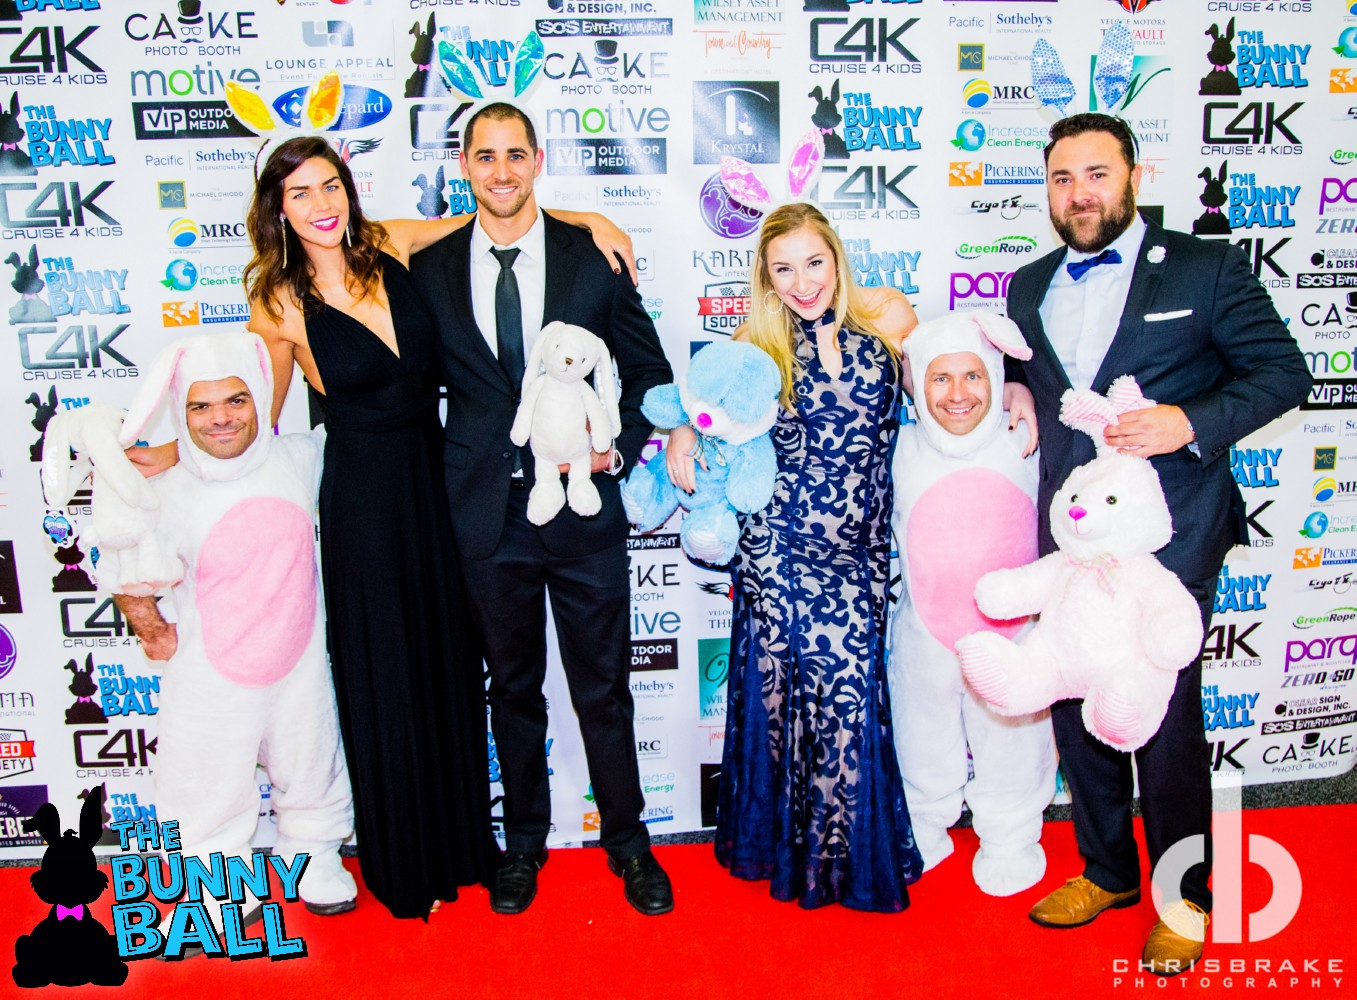 Bunny-Ball-2018-Chris-Brake- 144.jpg